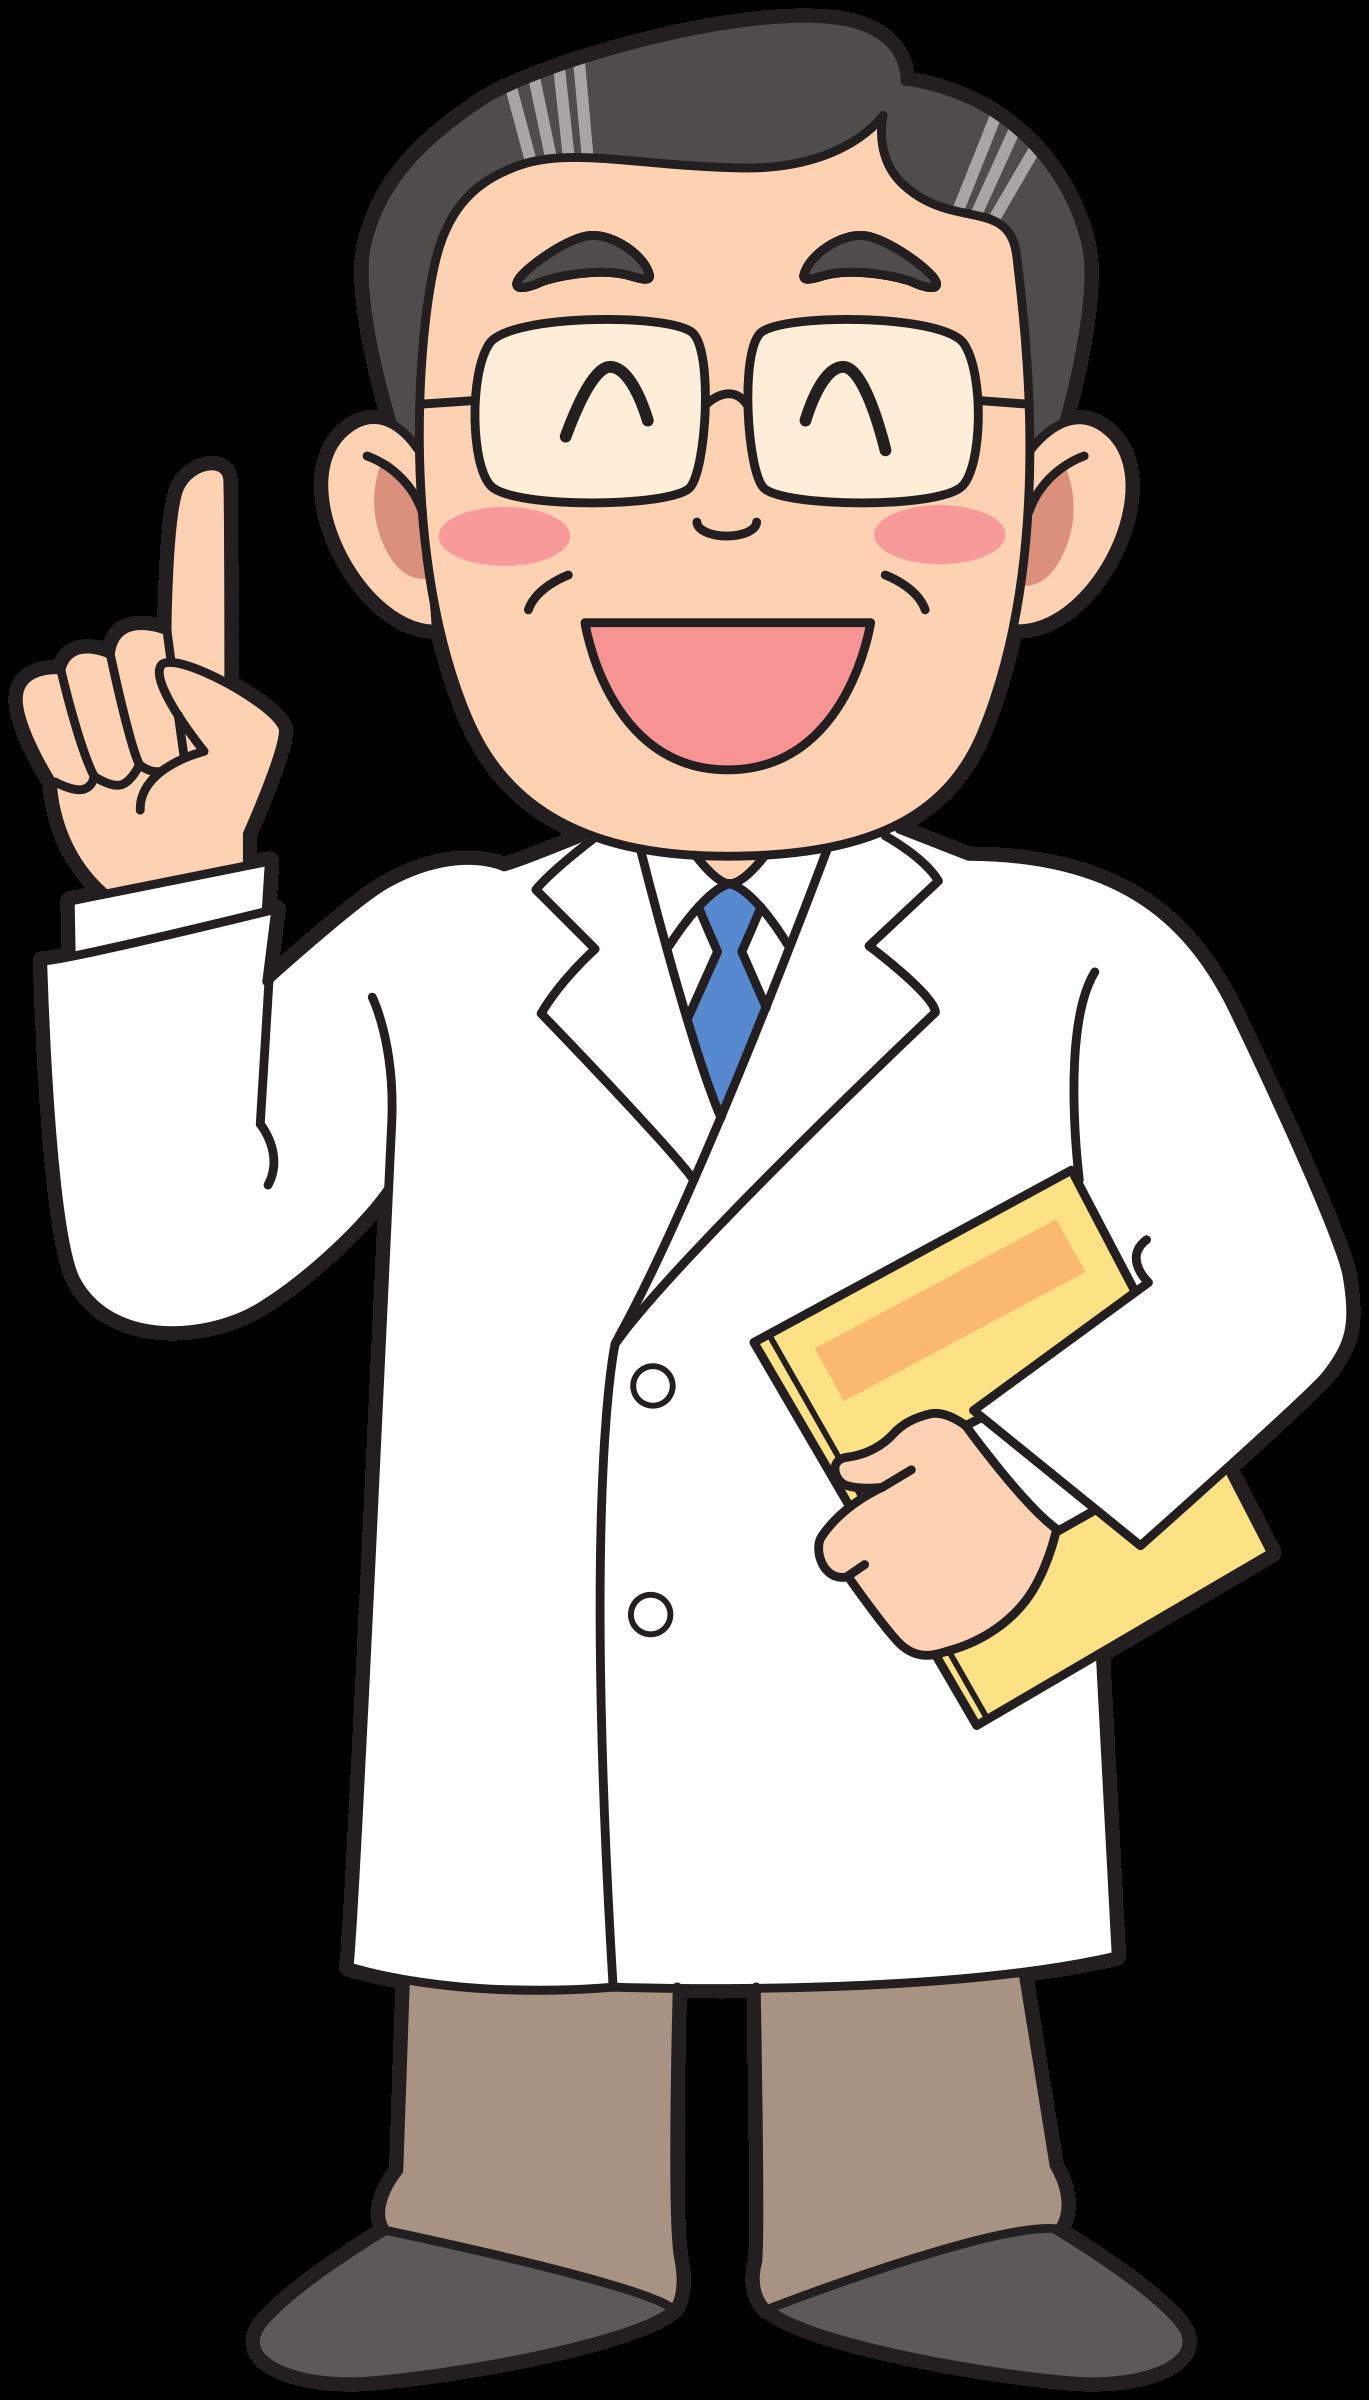 Medicine advise big image. Clipart man doctor